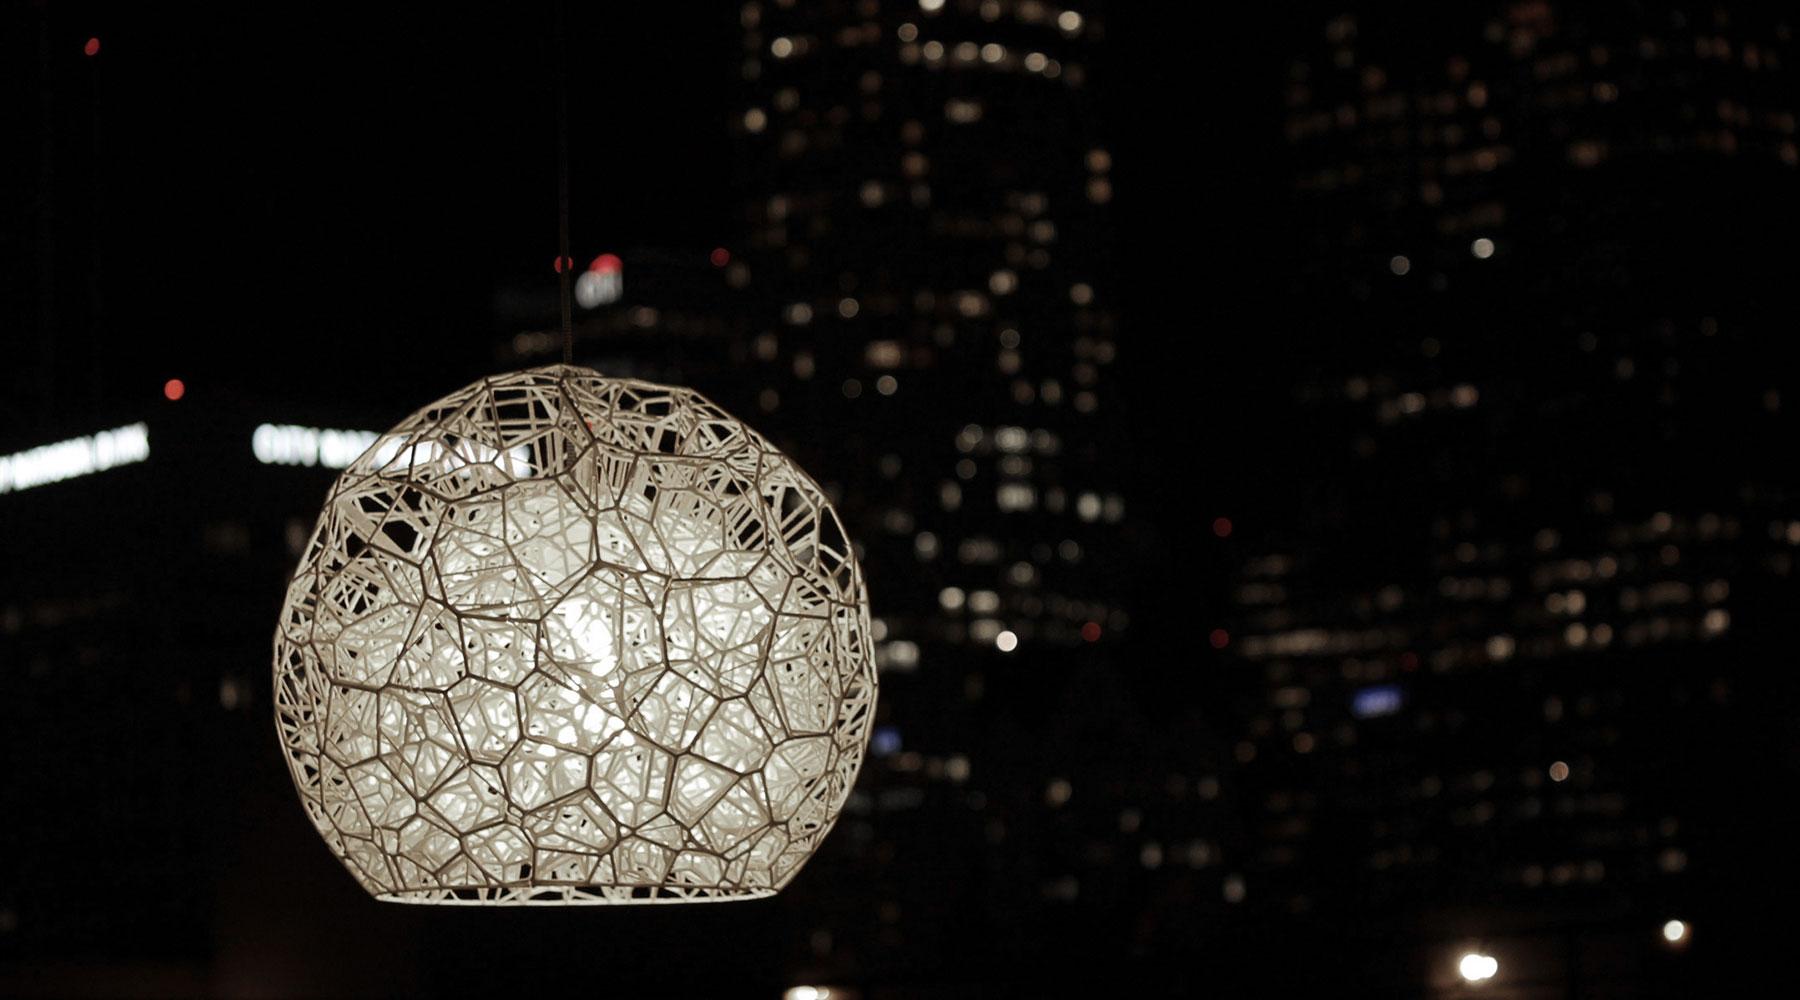 Burbuja Lamp (night)